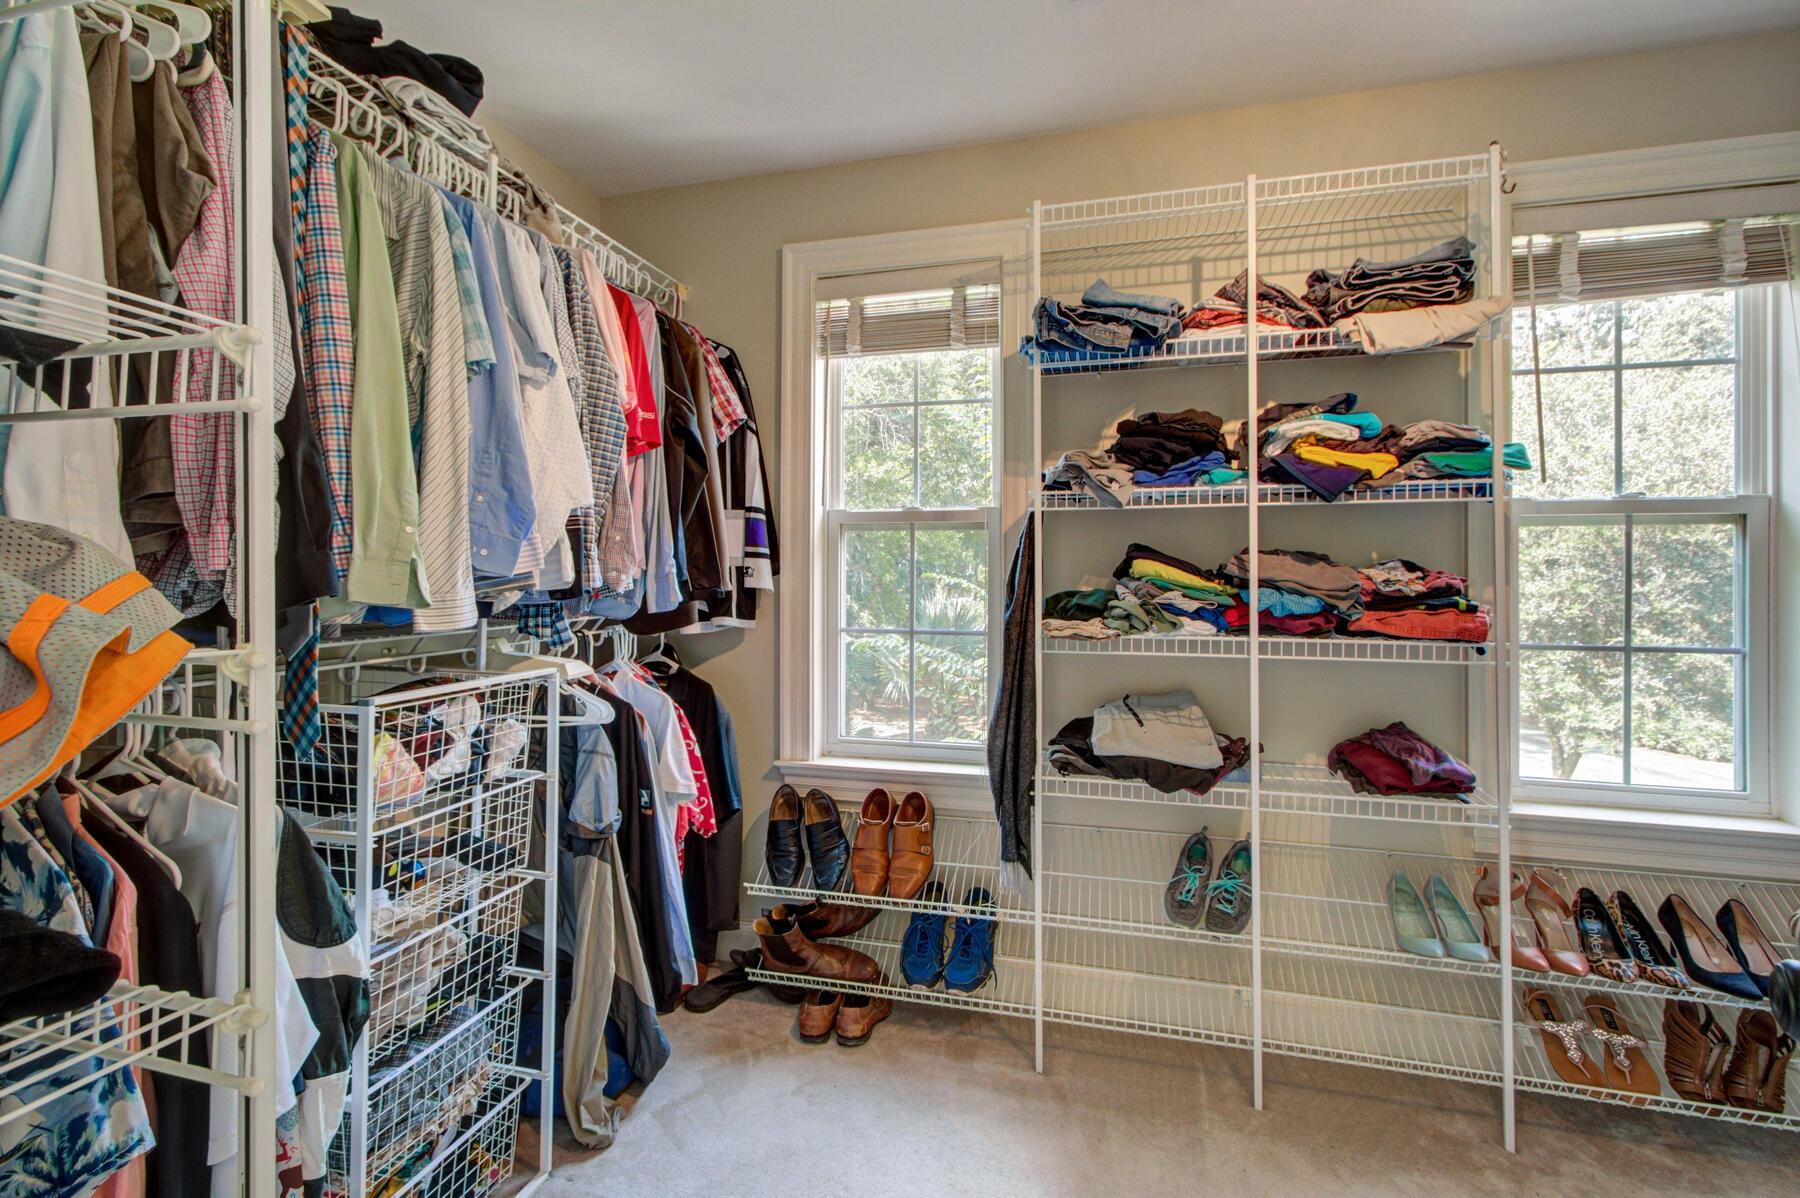 Dunes West Homes For Sale - 3095 Pignatelli, Mount Pleasant, SC - 25